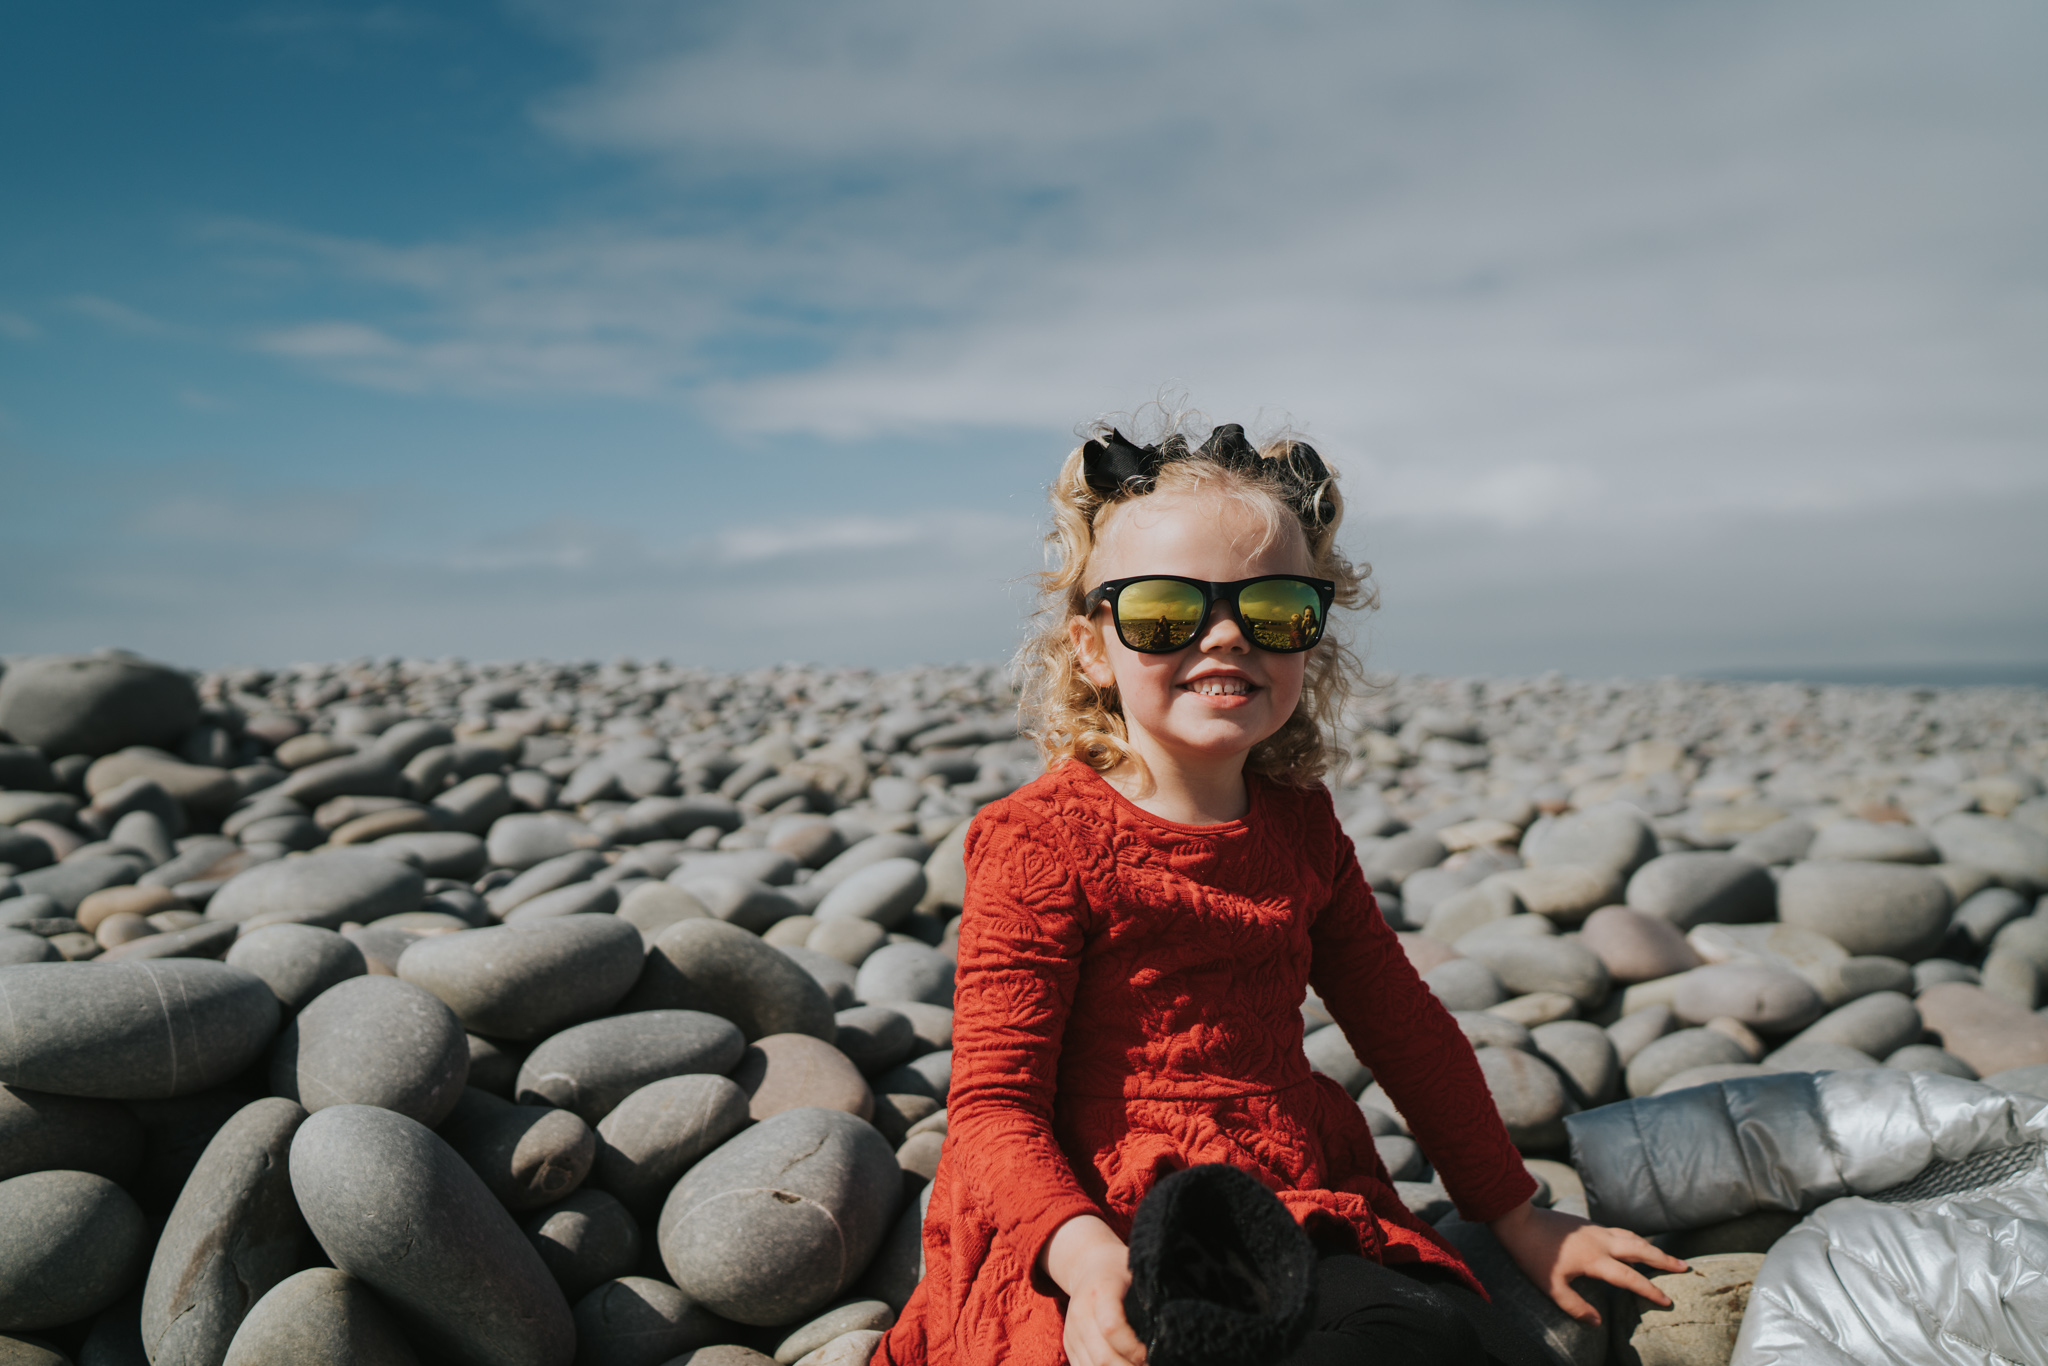 beach-family-session-westward-ho-north-devon-grace-elizabeth-devon-family-wedding-photographer-essex-devon-norfolk (43 of 43).jpg